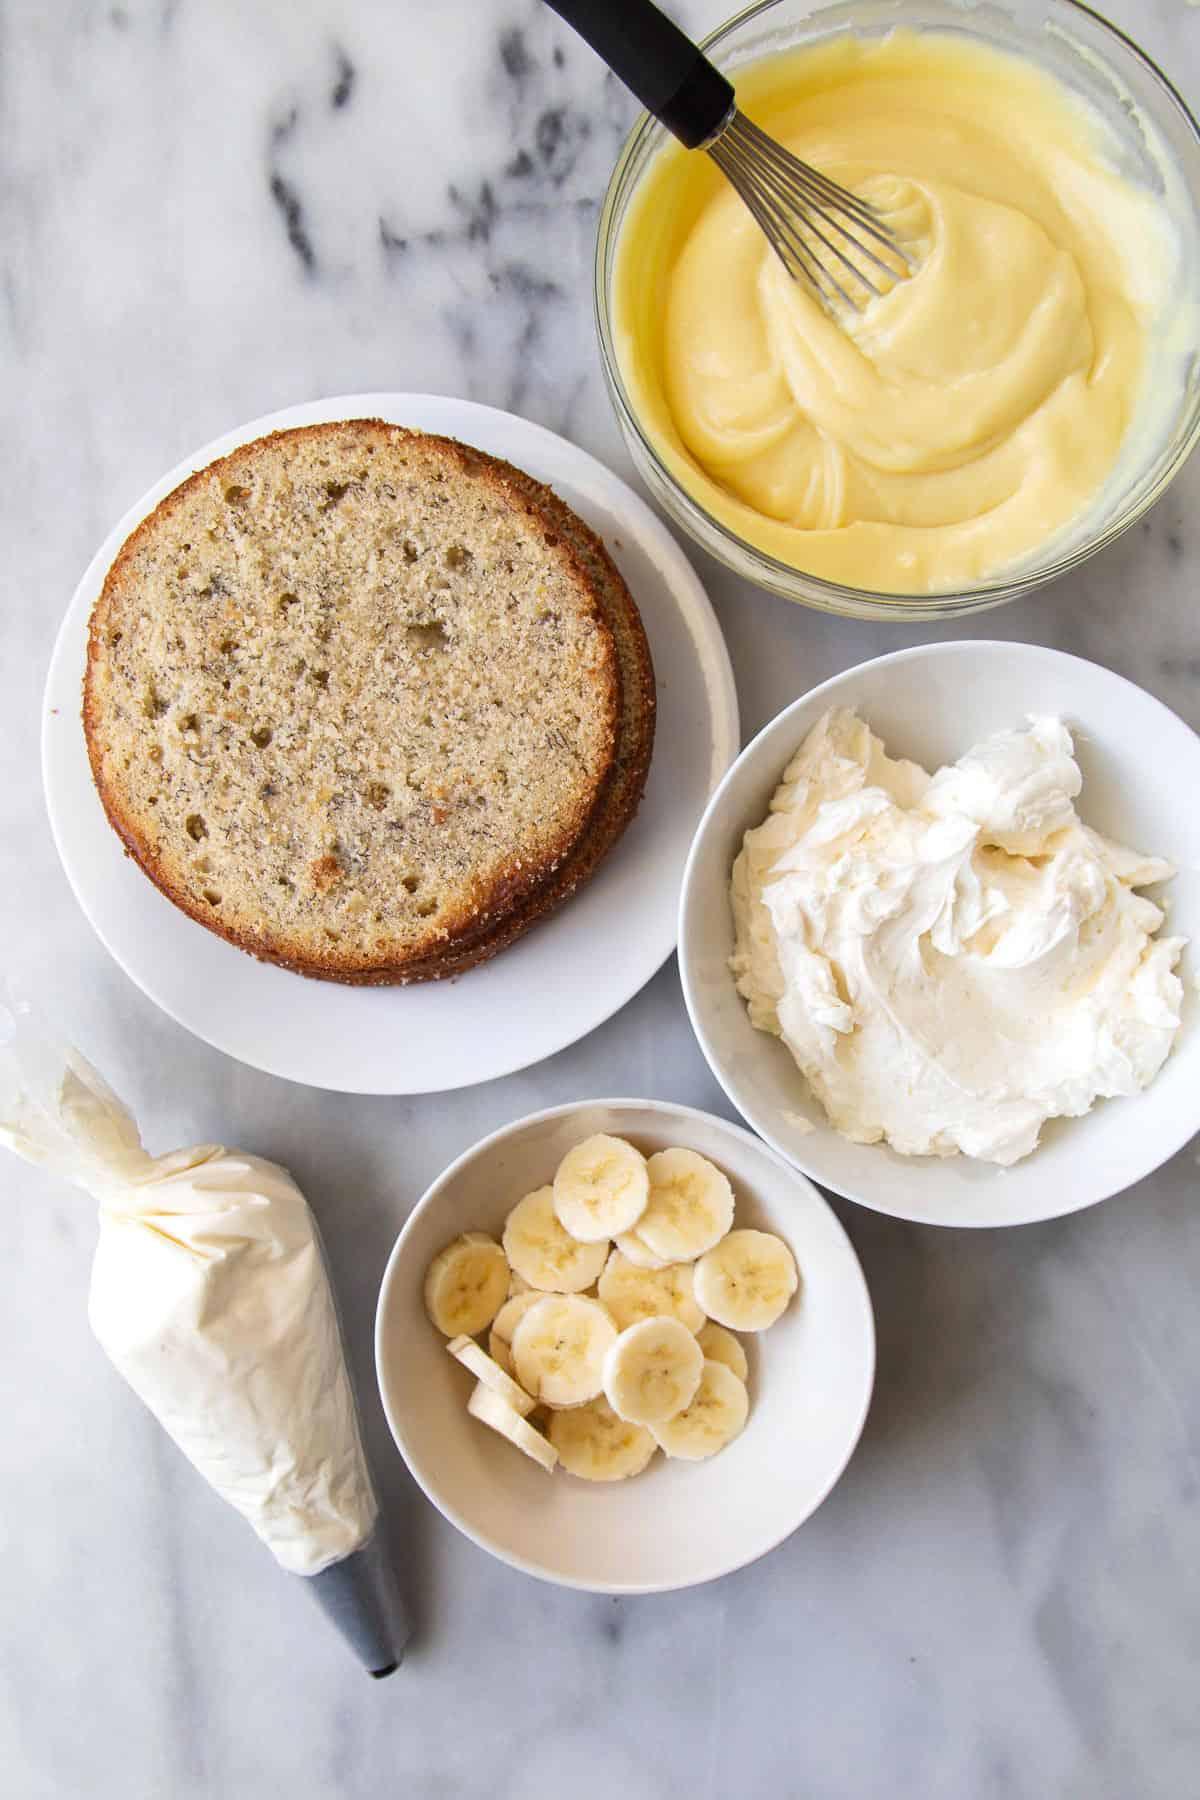 Banana Cream Cake components include pastry cream, sliced bananas, and banana cake layers